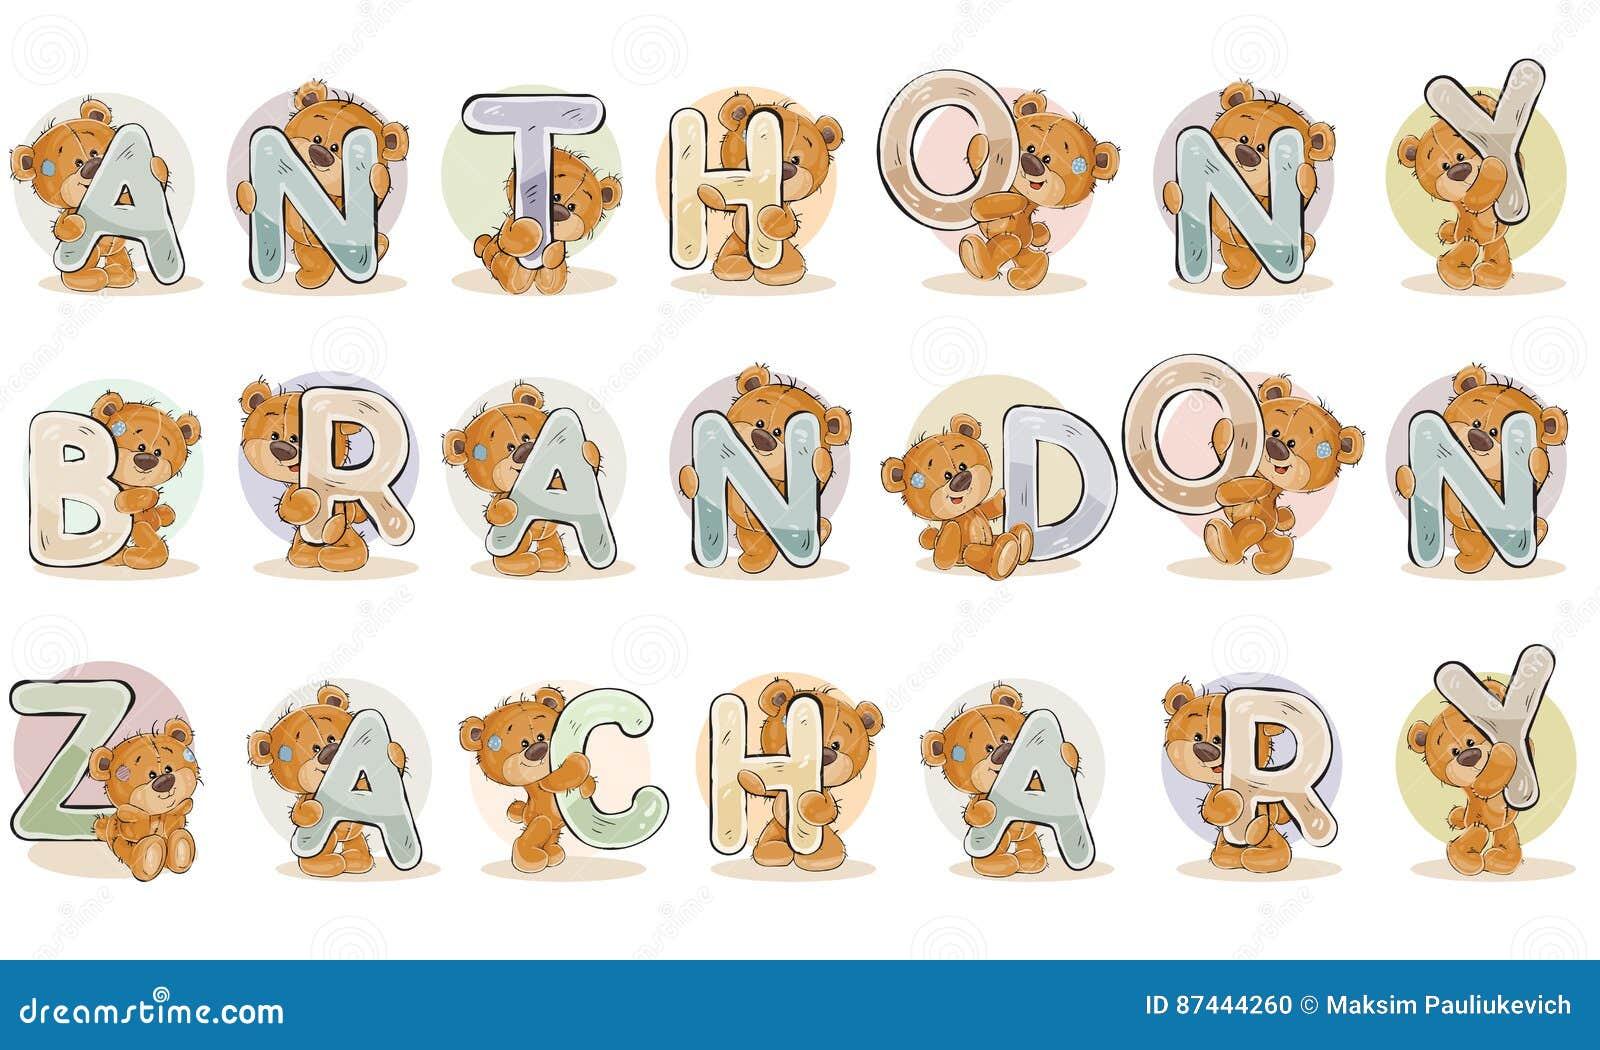 Names for boys anthony brandon zachary made decorative - Letras decorativas infantiles ...